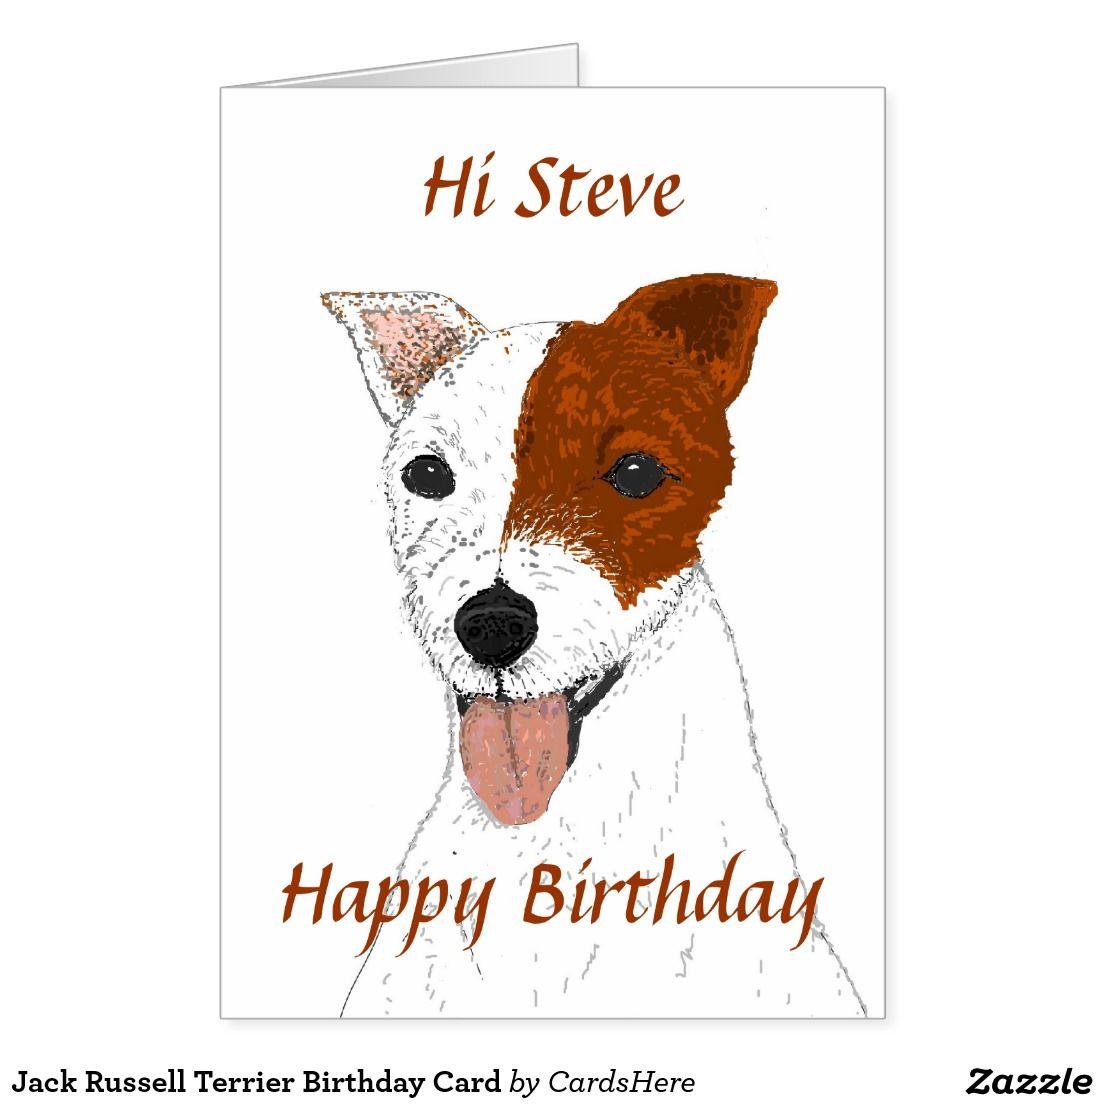 Jack Russell Terrier Birthday Card Jack Russell Jack Russell Terrier Birthday Cards